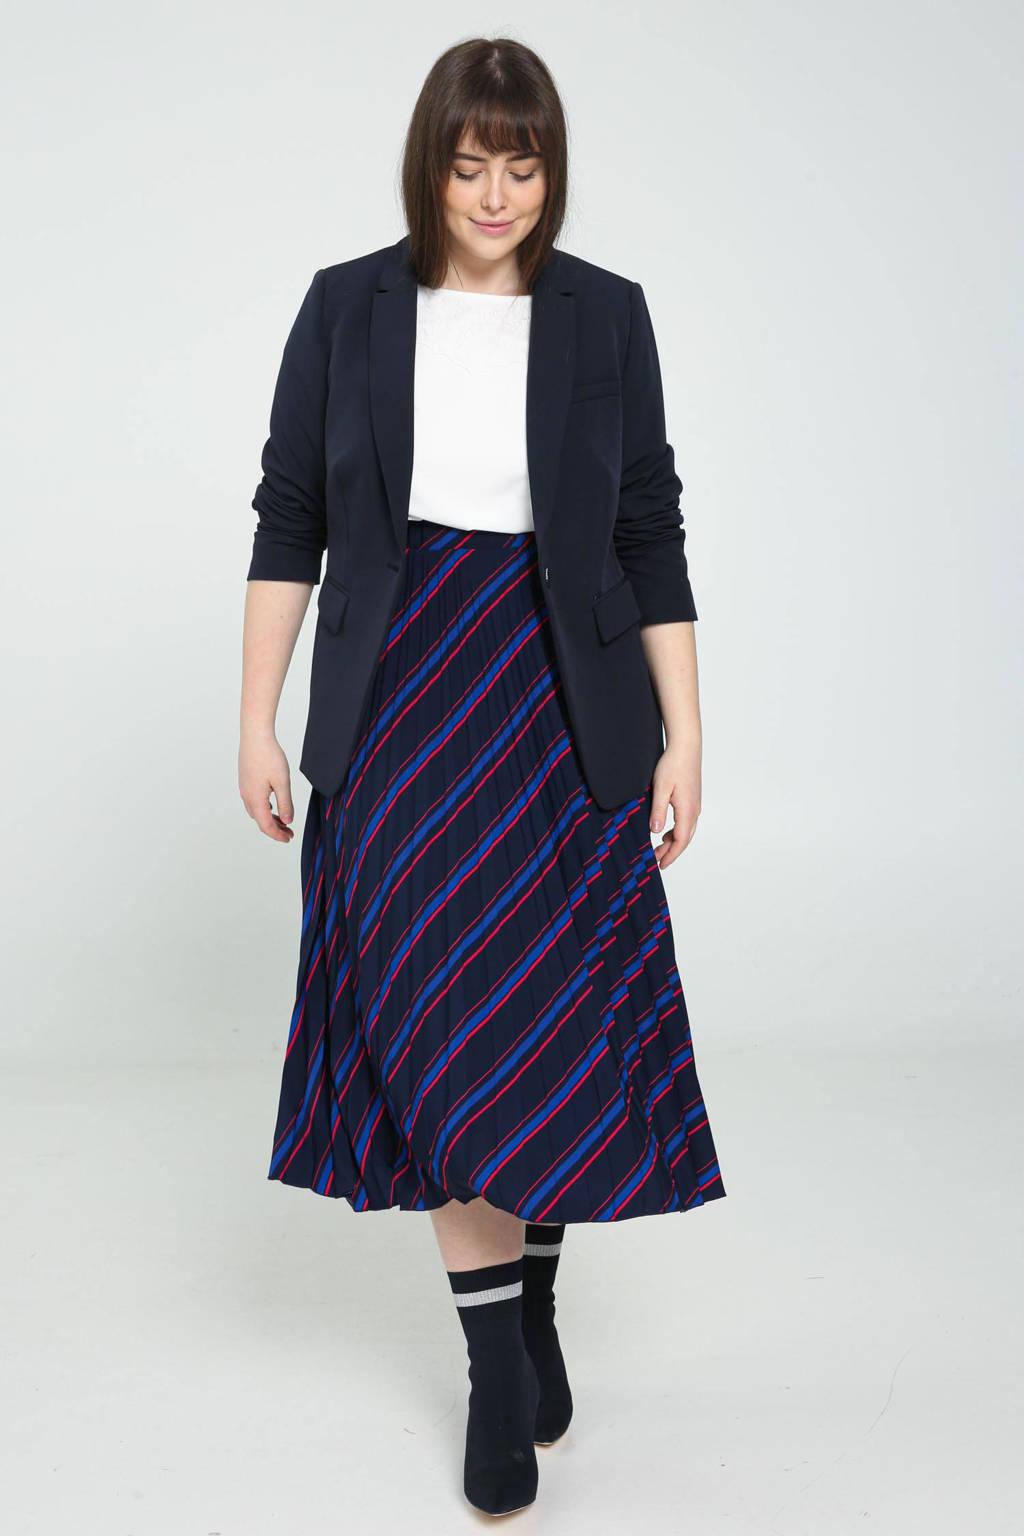 PROMISS gestreepte rok donkerblauw/blauw/rood, Donkerblauw/blauw/rood